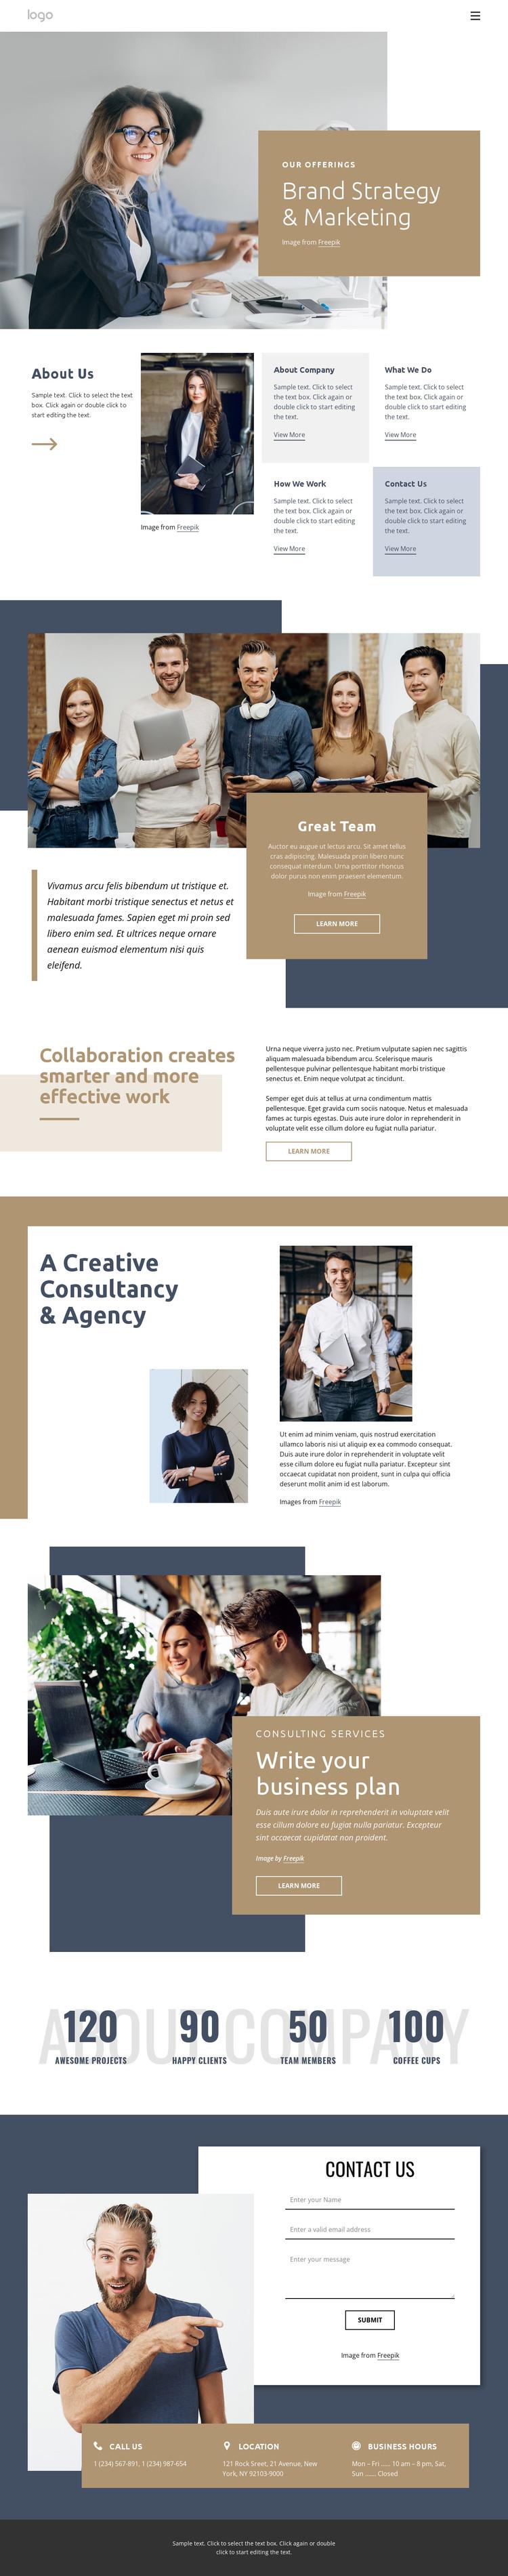 Brand strategy and marketing Web Design